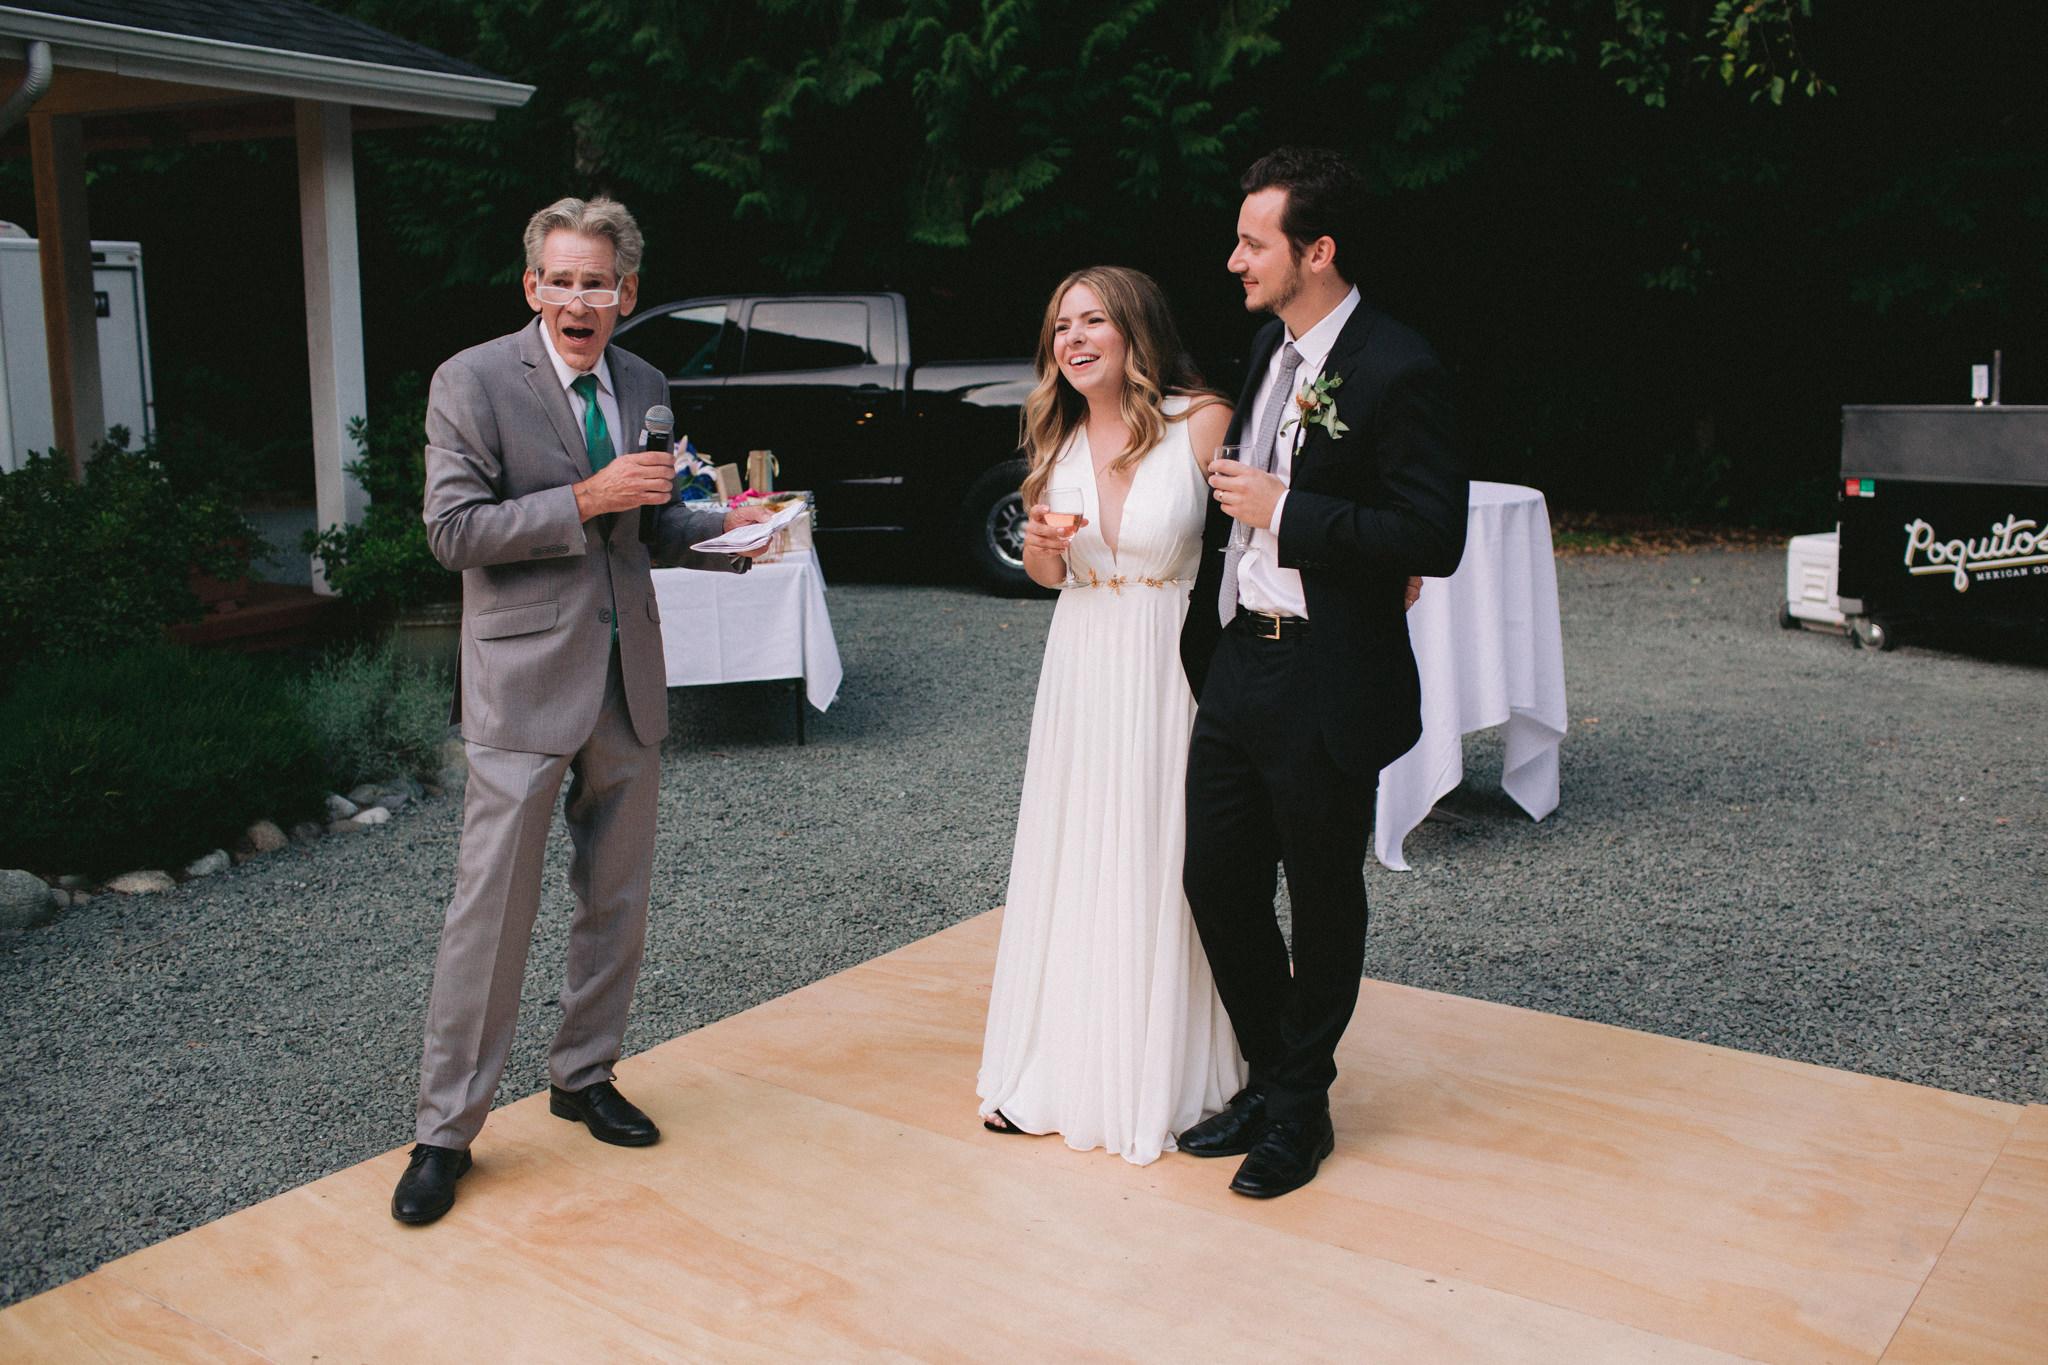 Backyard-Bainbridge-Island-Wedding-Alycia-Lovell-Photography-200.JPG